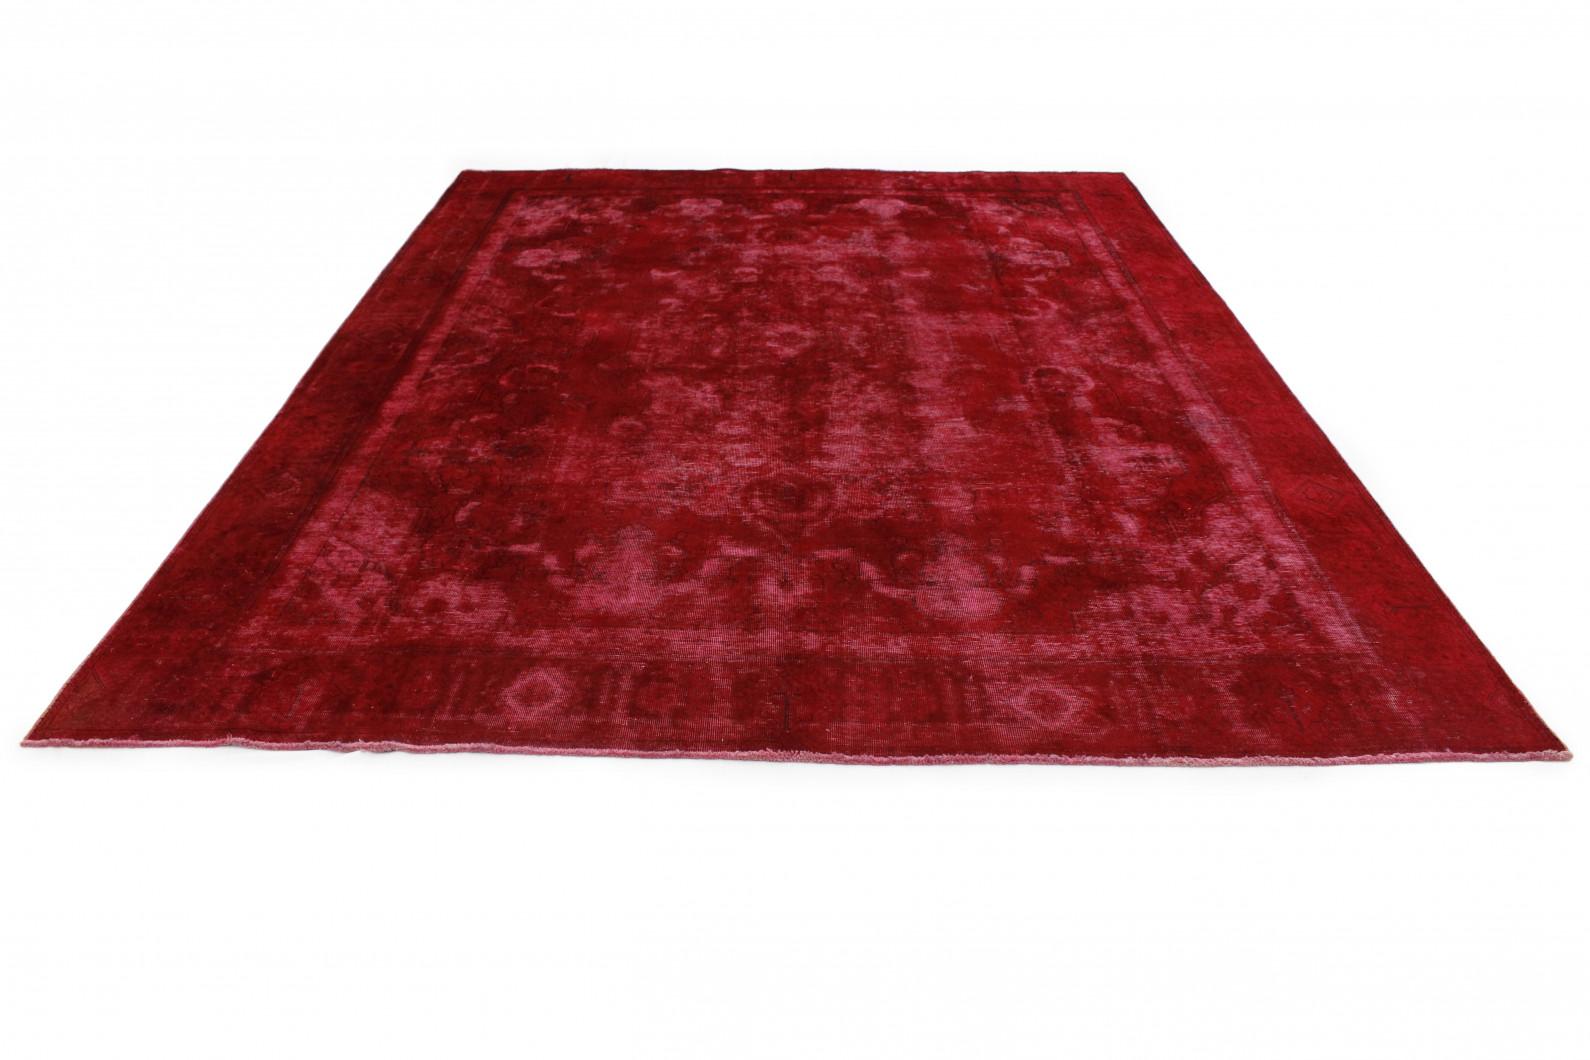 vintage teppich rot in 380x280cm 1001 3368 bei kaufen. Black Bedroom Furniture Sets. Home Design Ideas